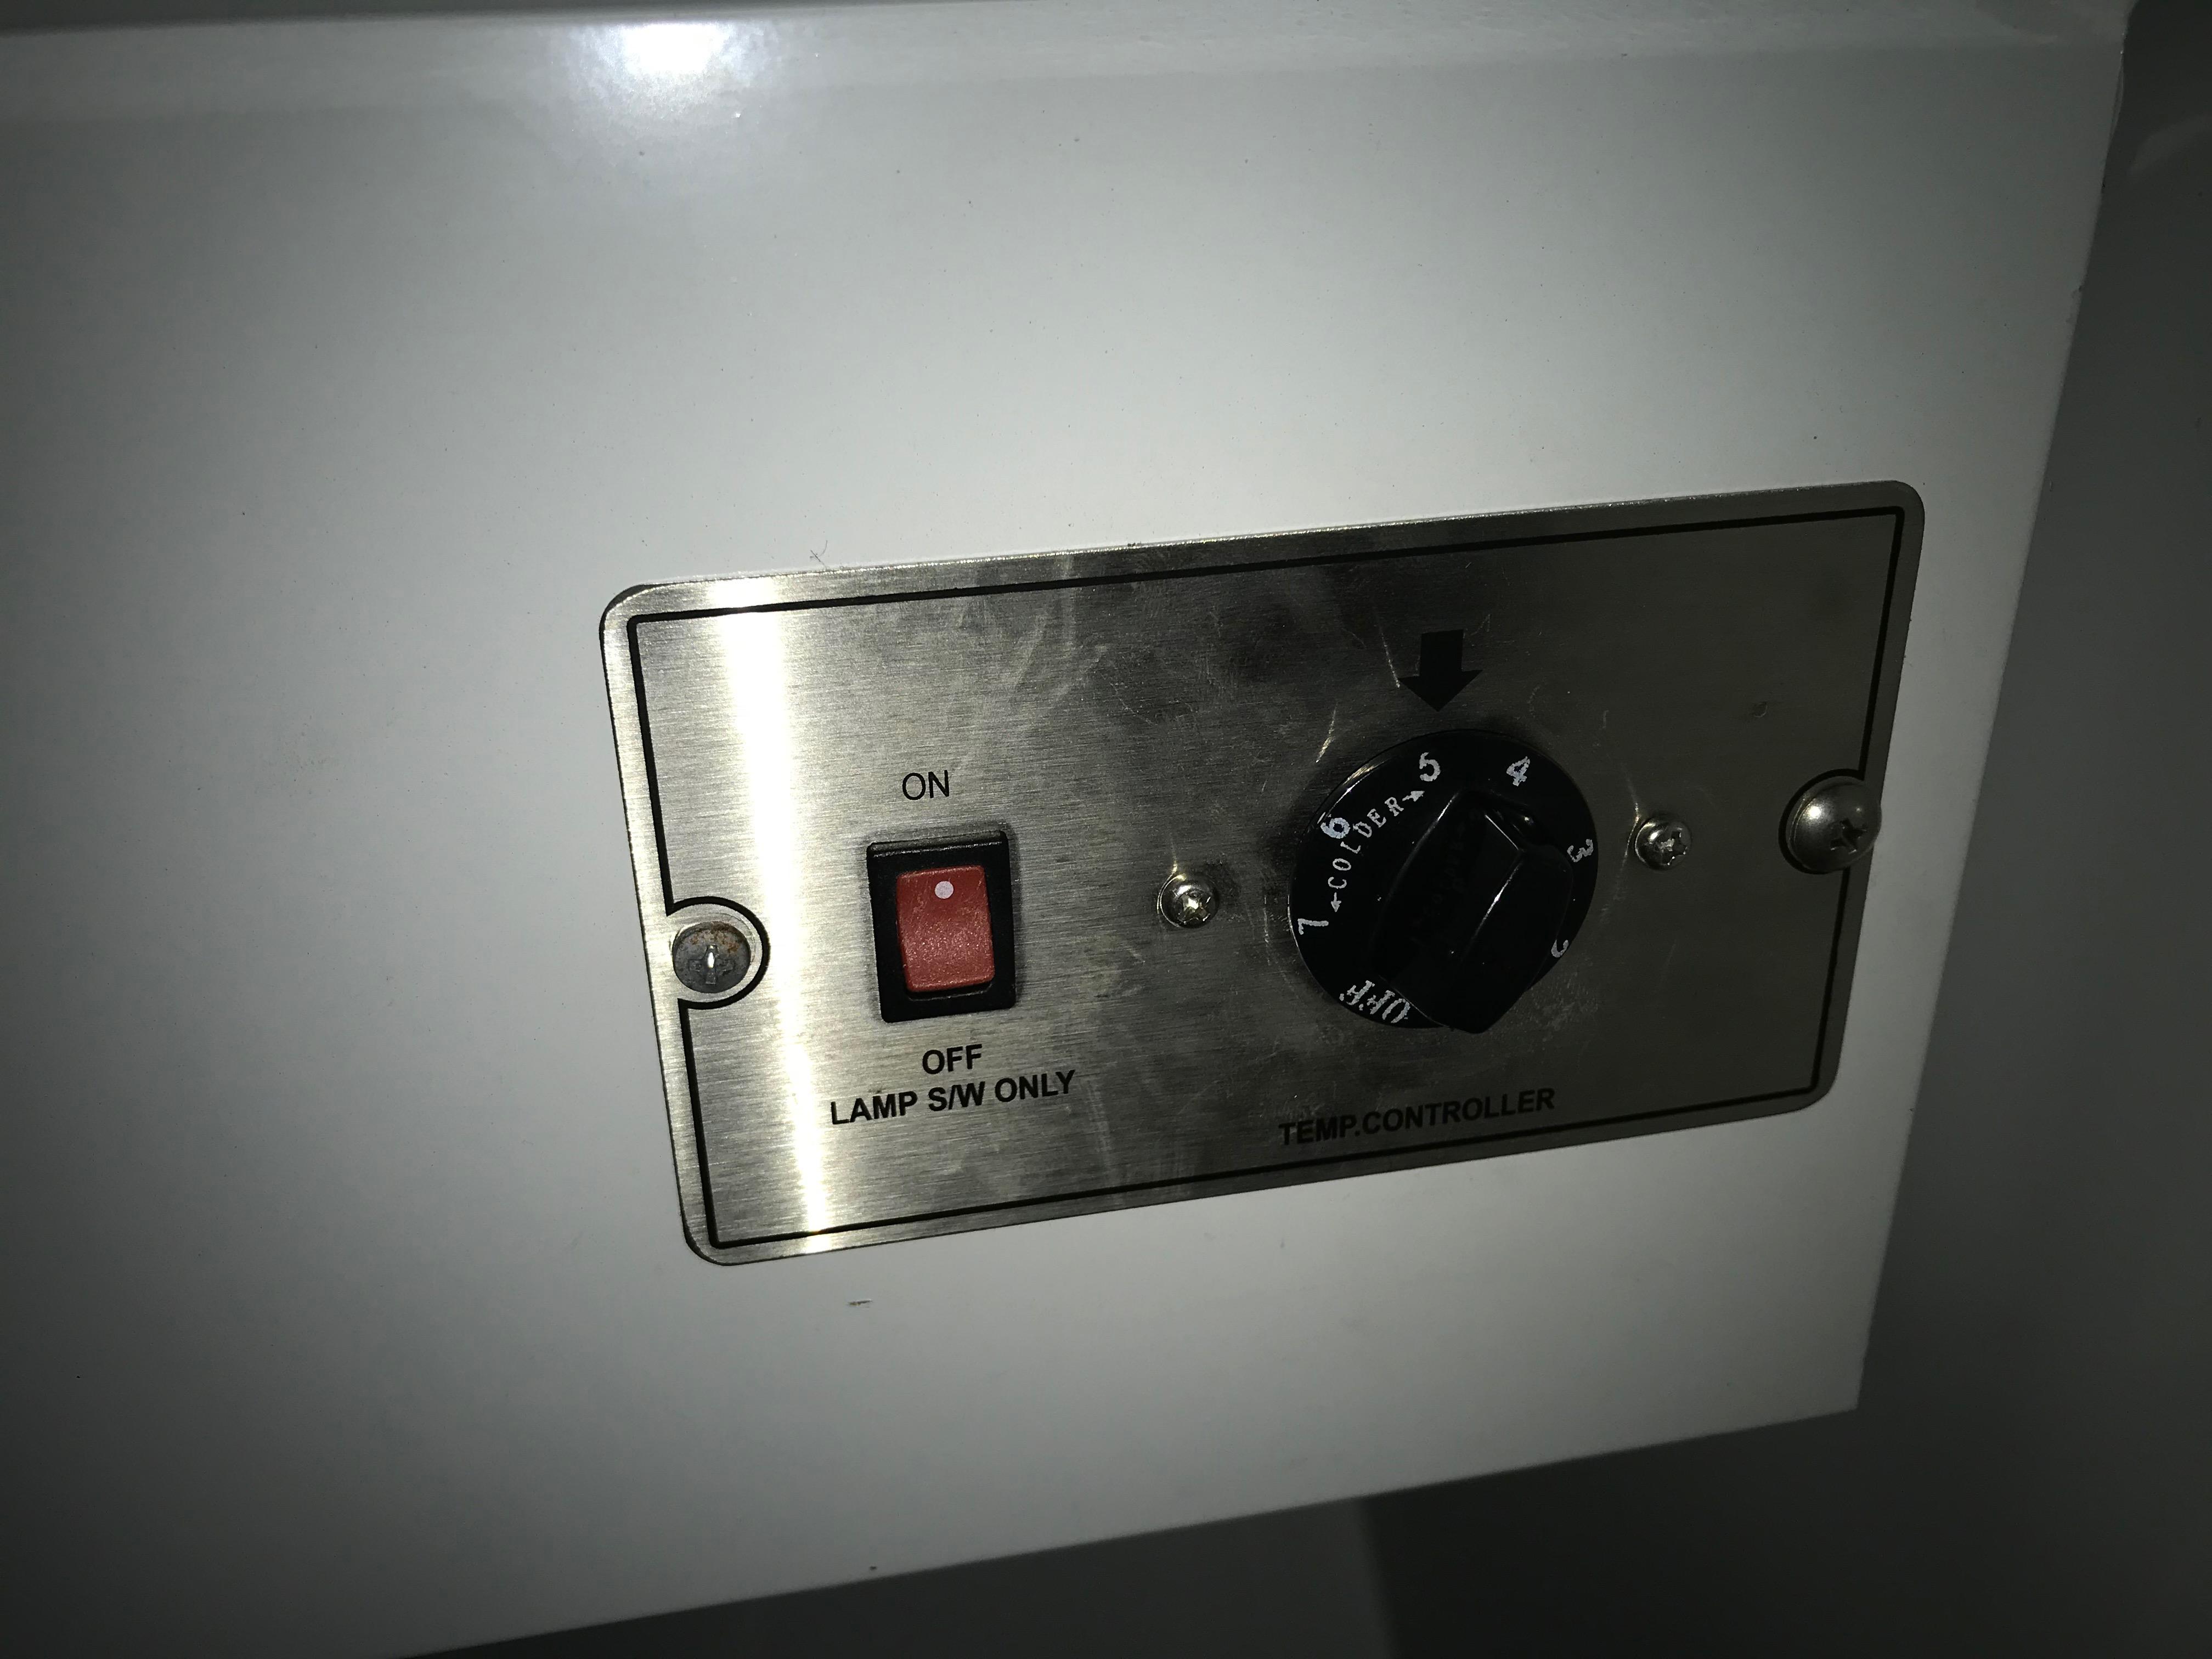 Commercial Fridge Compressor And Compressor Fan Not Starting